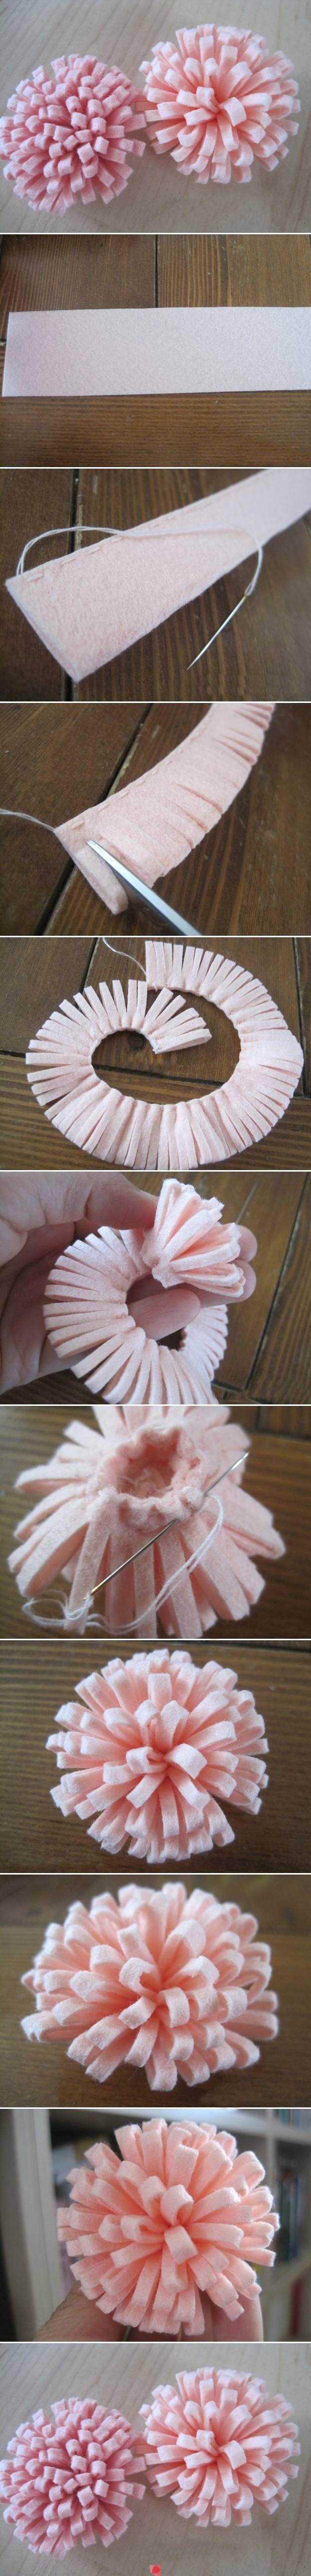 Pretty fringe-cut rolled felt flower. Idea - use crepe or plain paper to make similar paper flower! :)